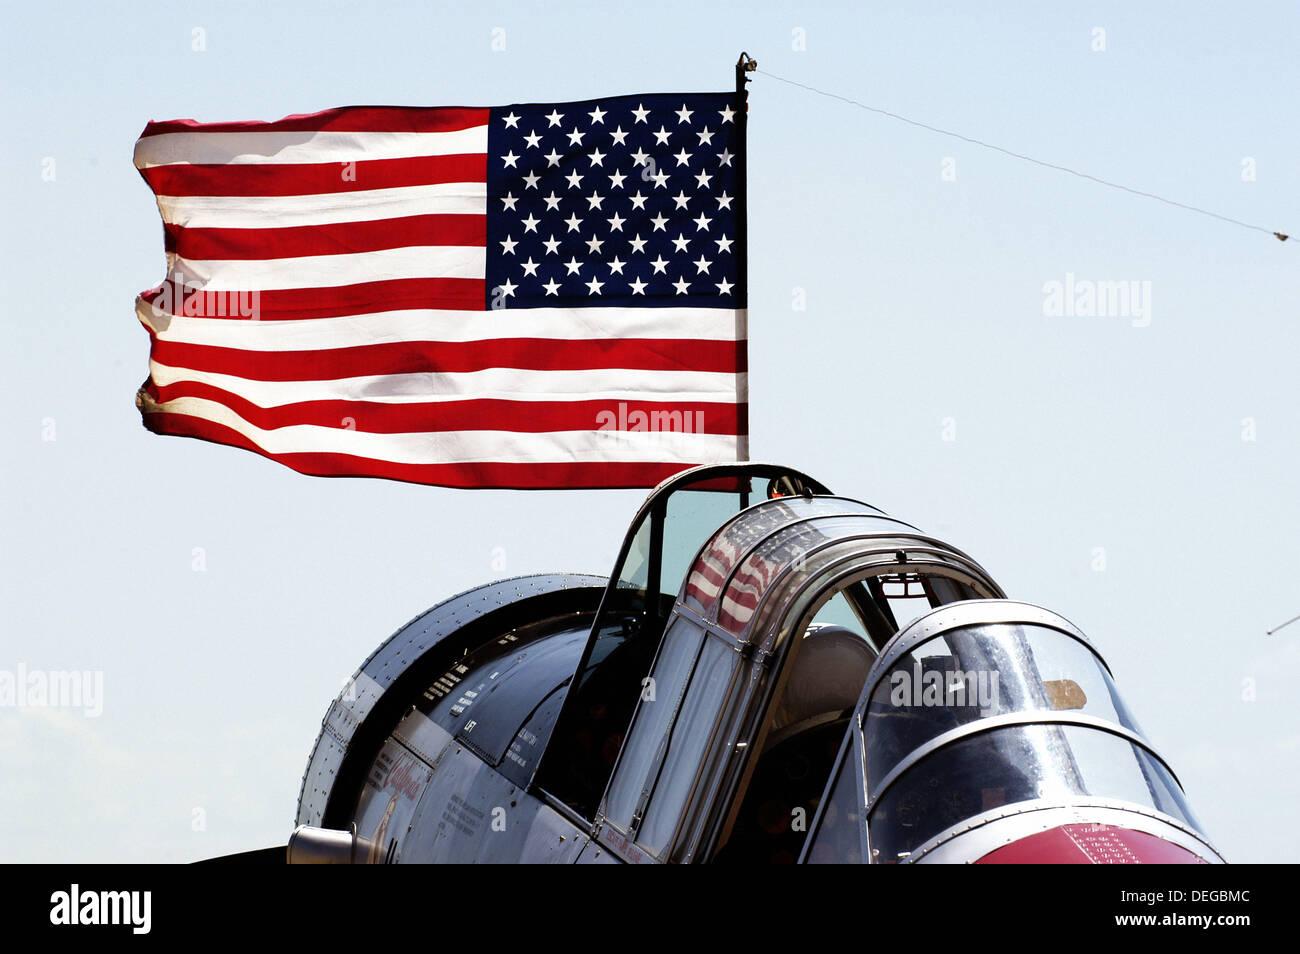 World War II aircraft on display. Selfridge Air Force Base, Mt. Clemens. Michigan. USA - Stock Image